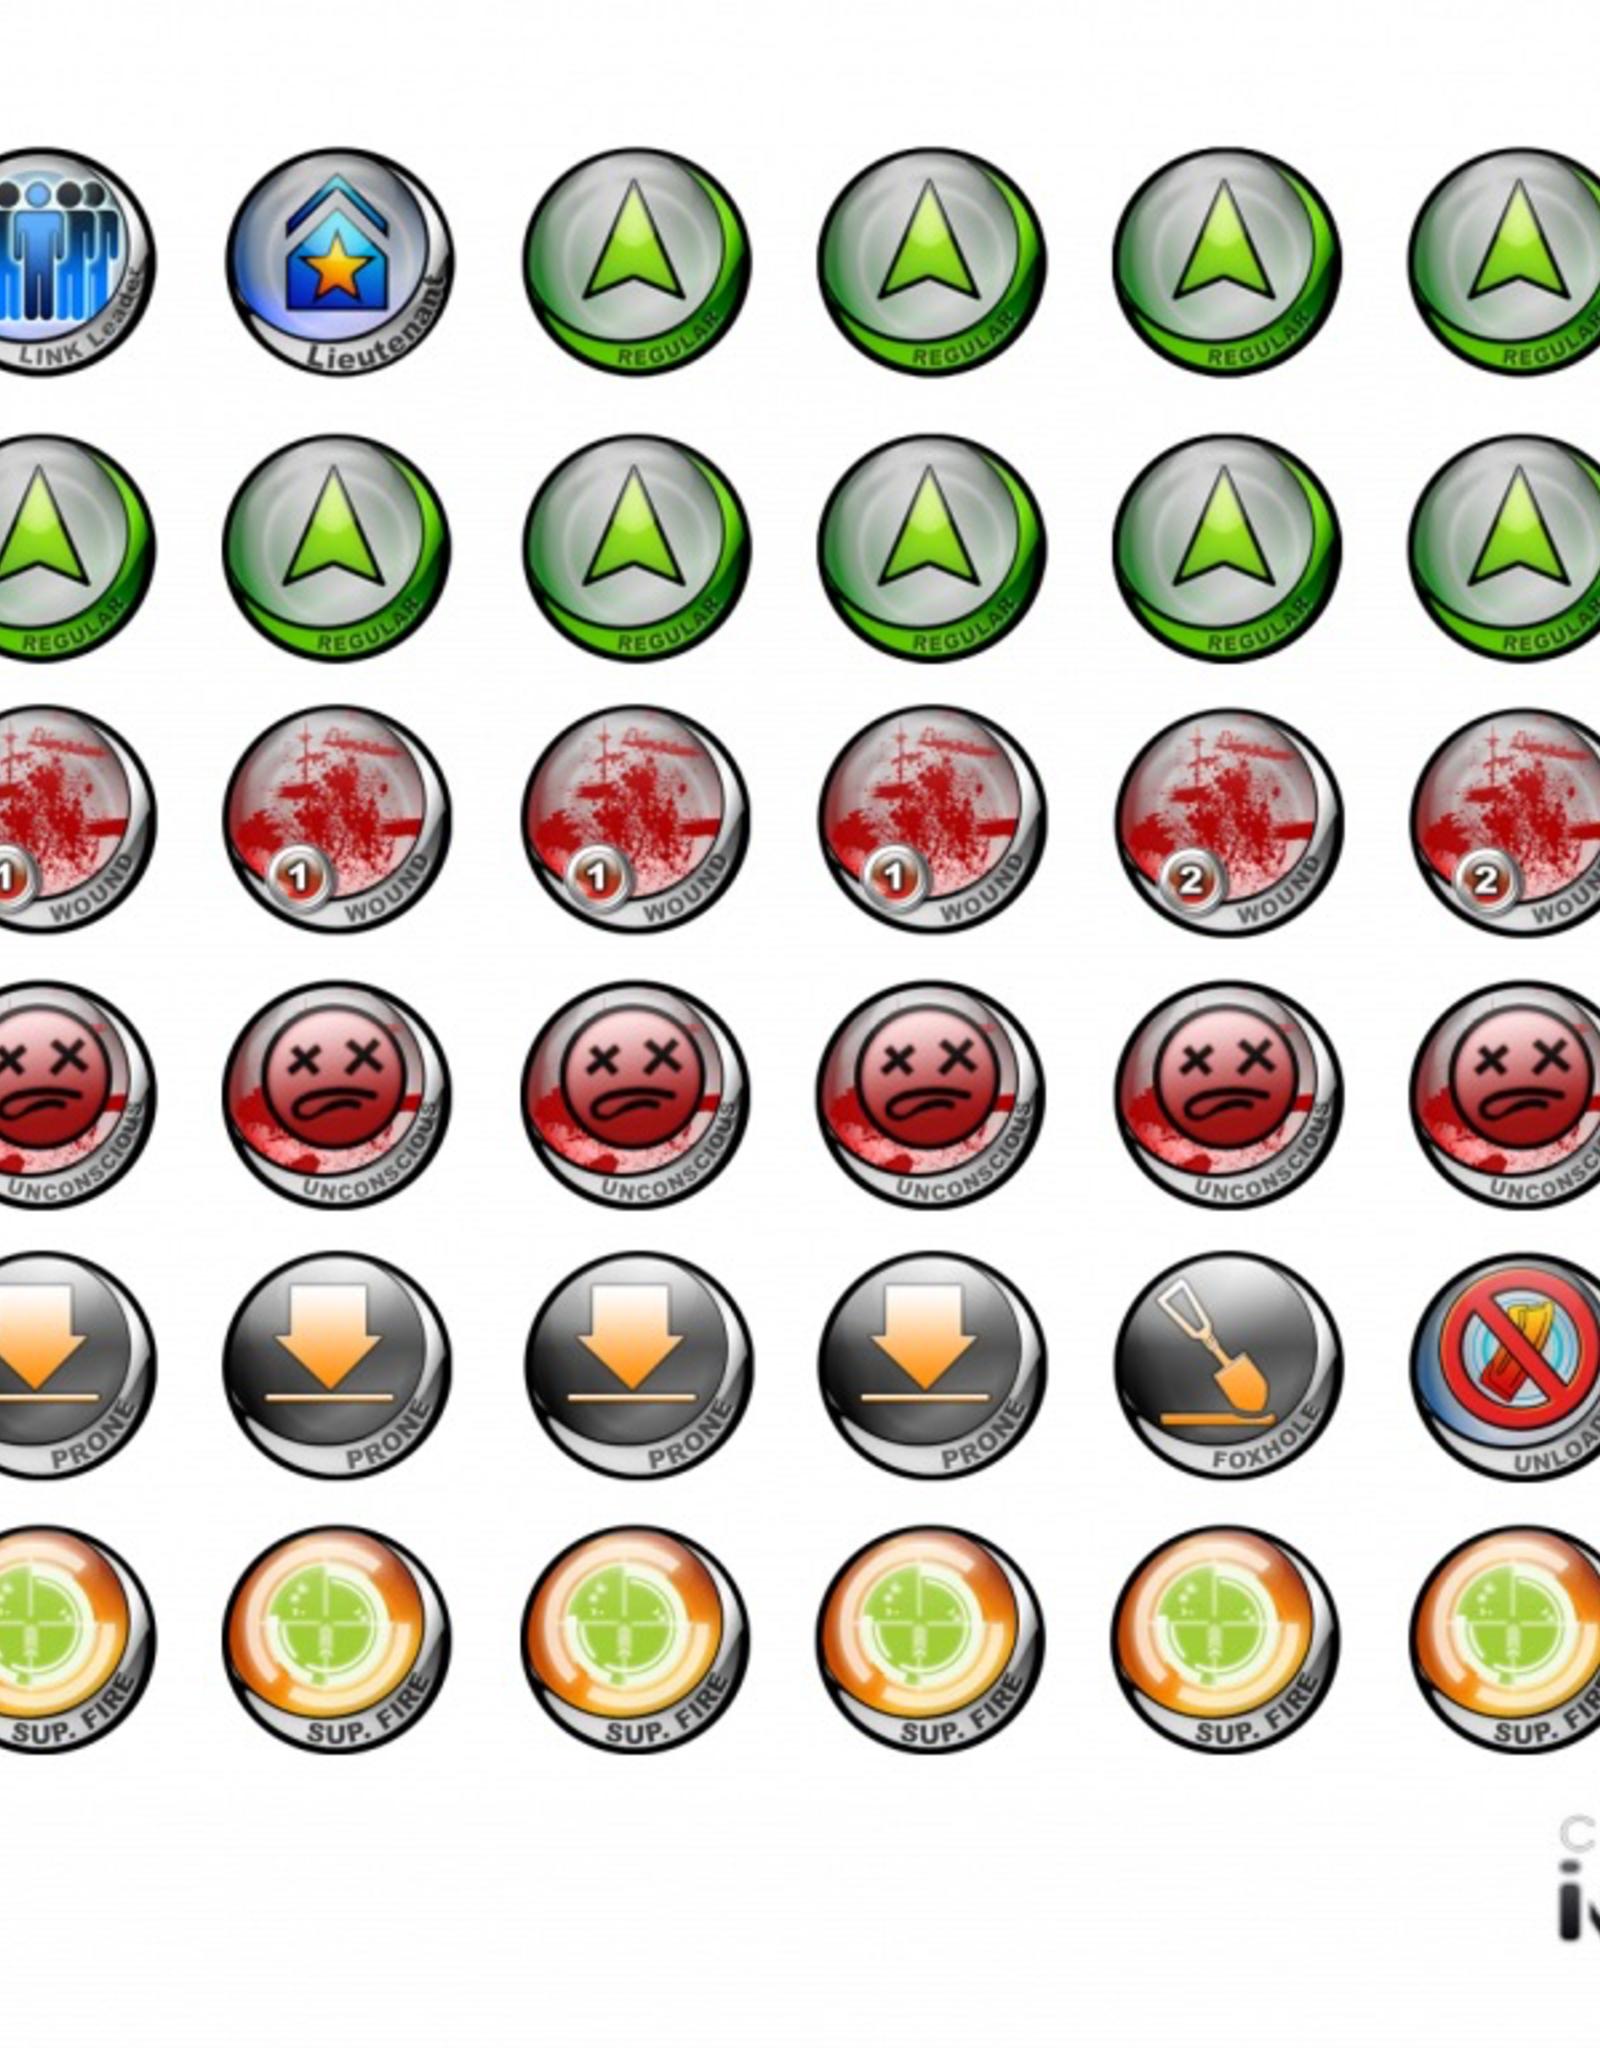 MicroArt - Zubehör Infinity Tokens Starter 01 New Version N3 (36)